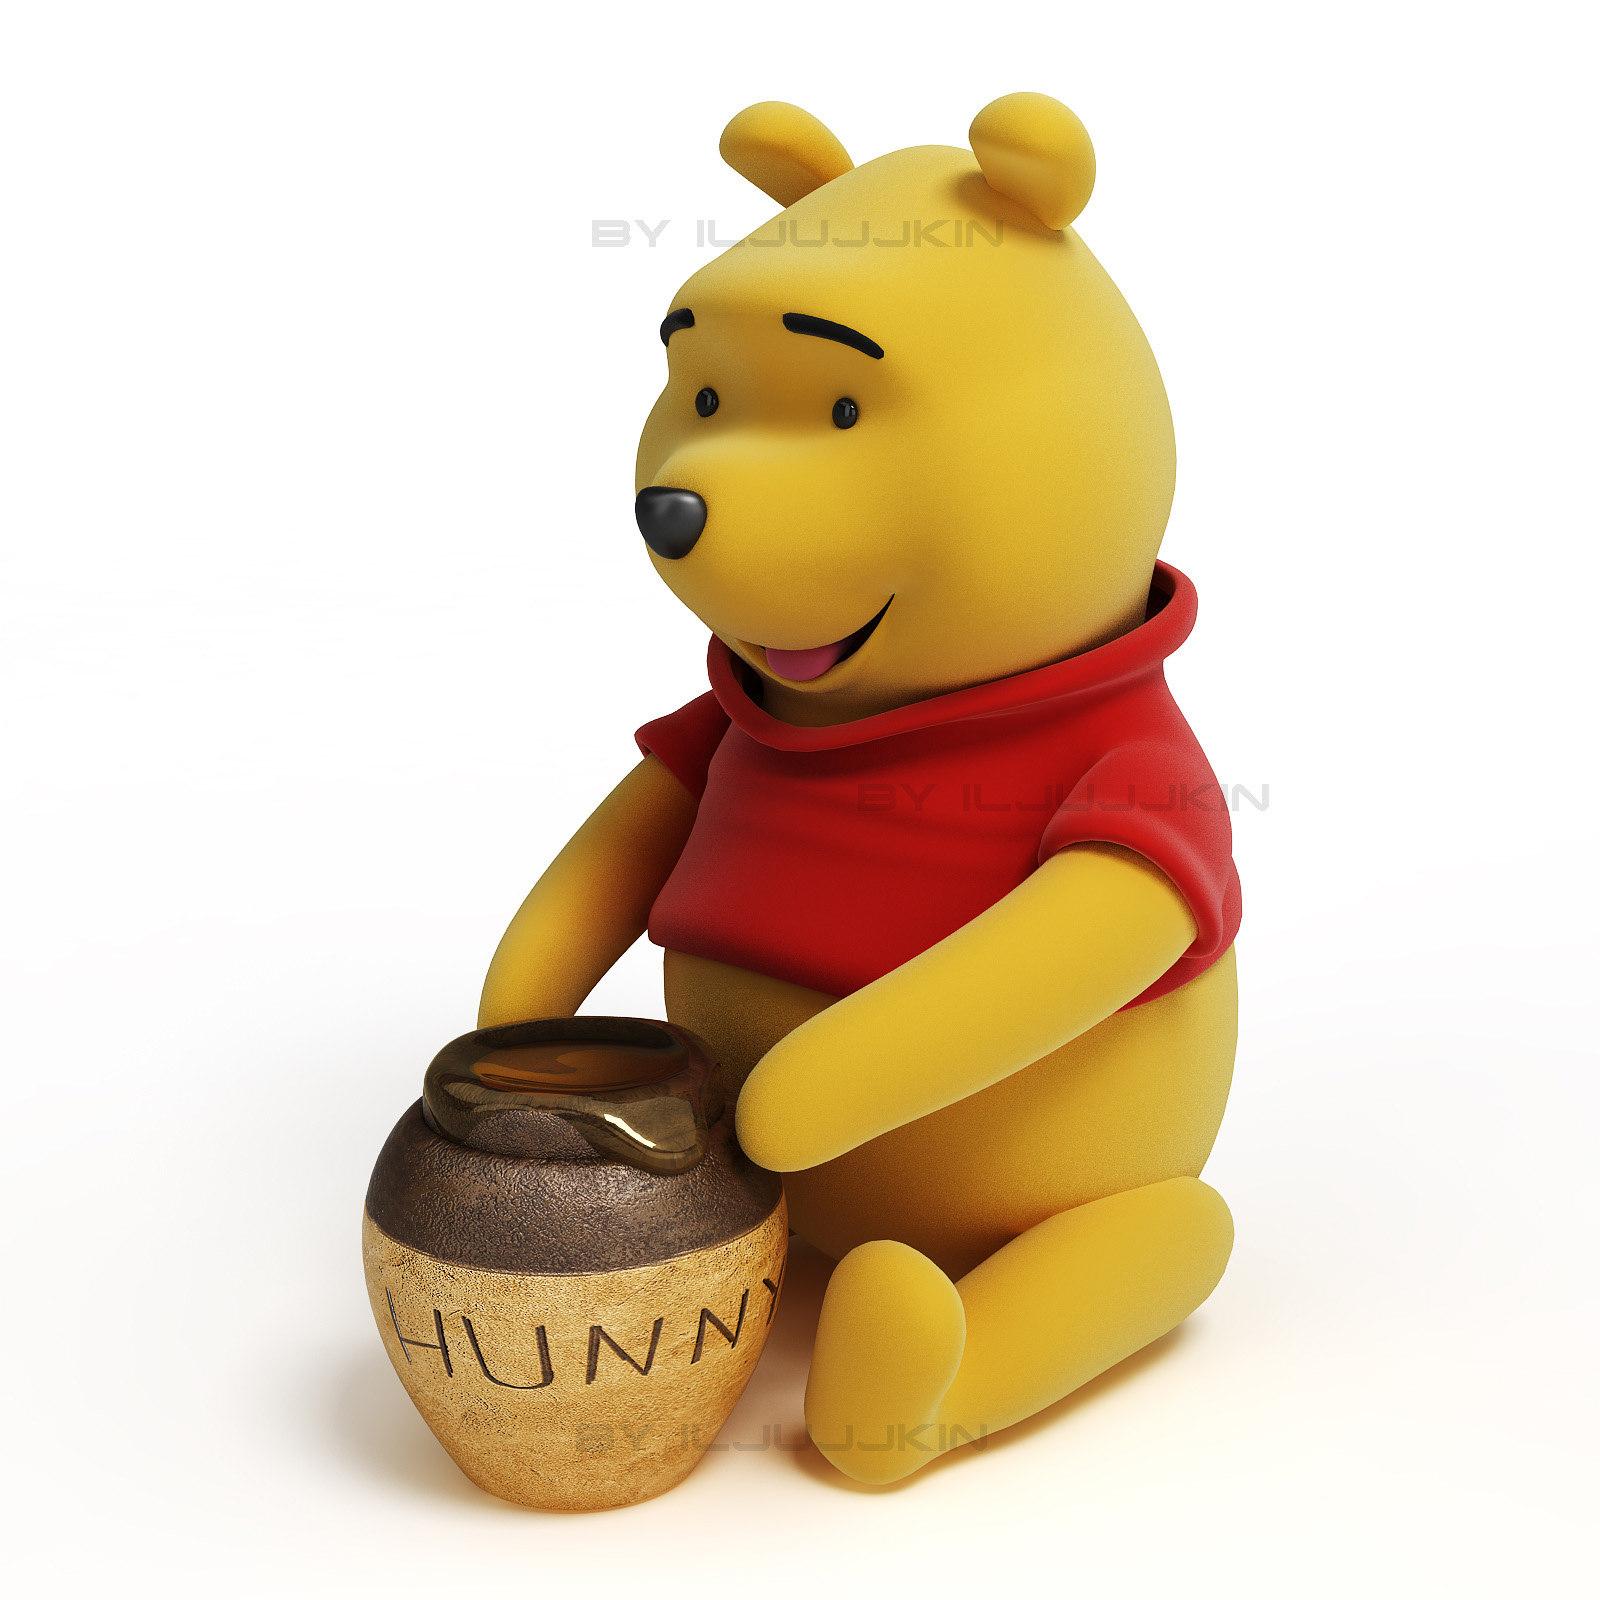 Winnie_the_pooh_Hunny_01_vat.jpg